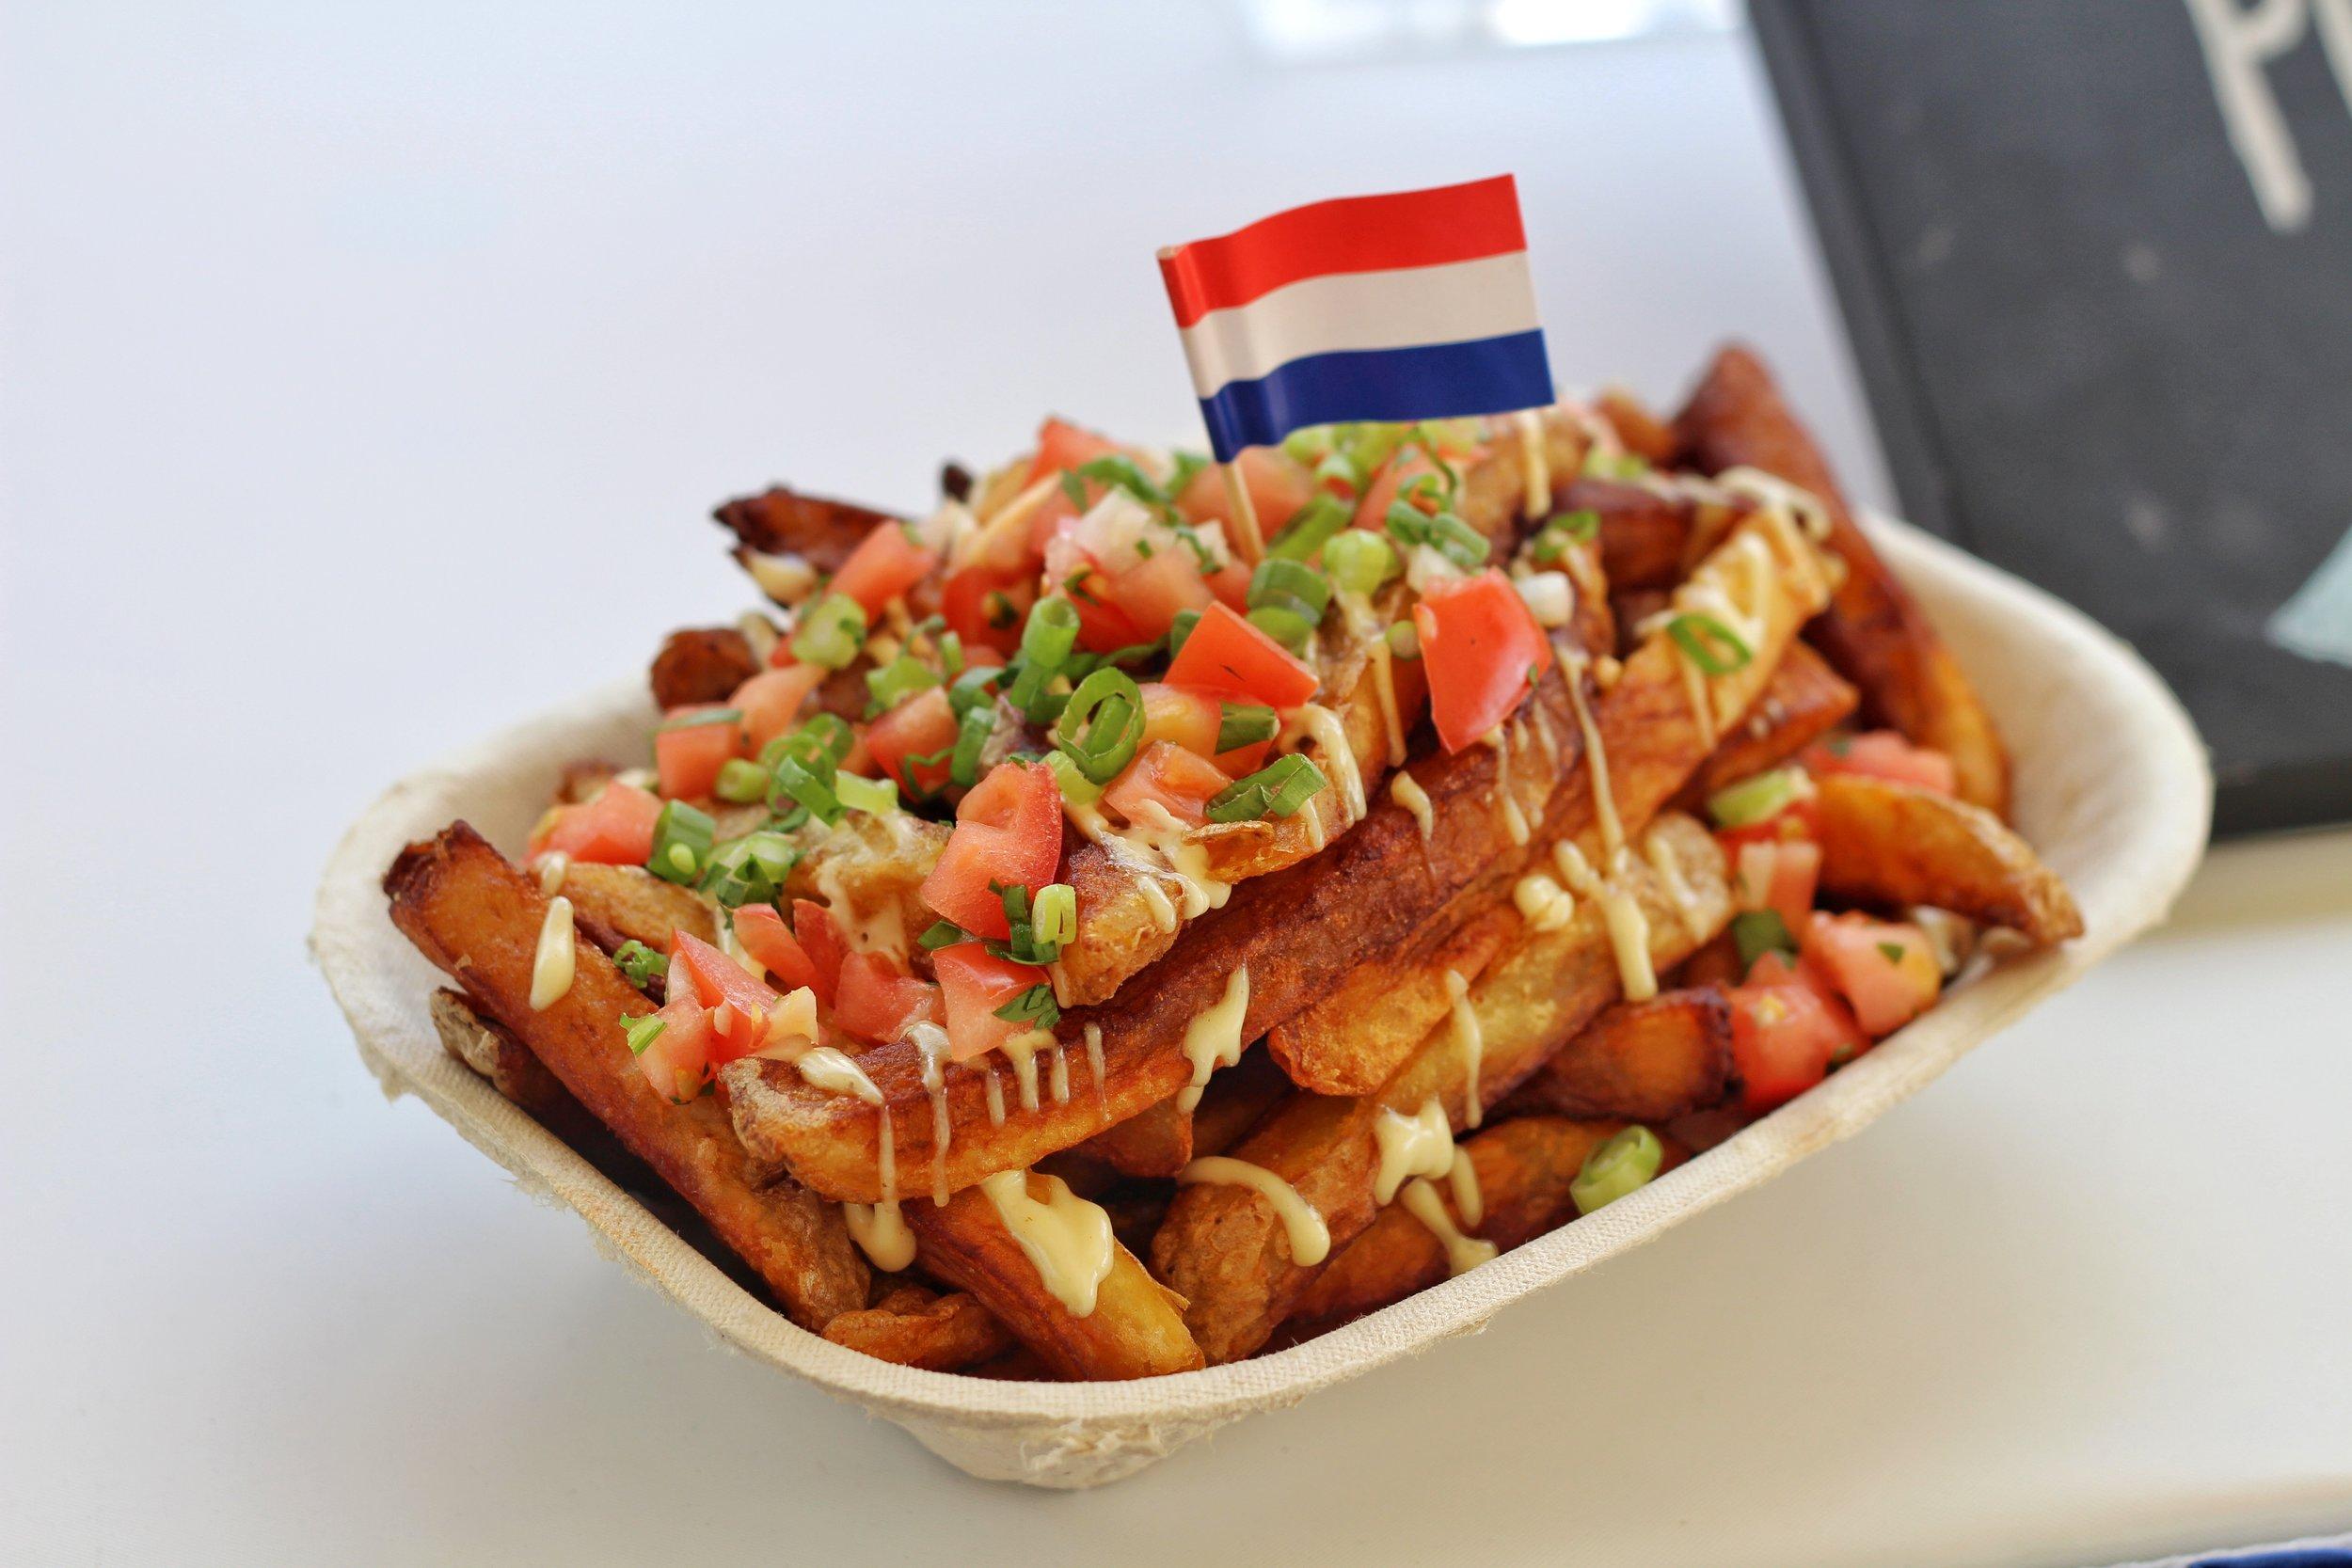 Crispy hand-cut fries in partnership with the vegan Toronto restaurant Planta.